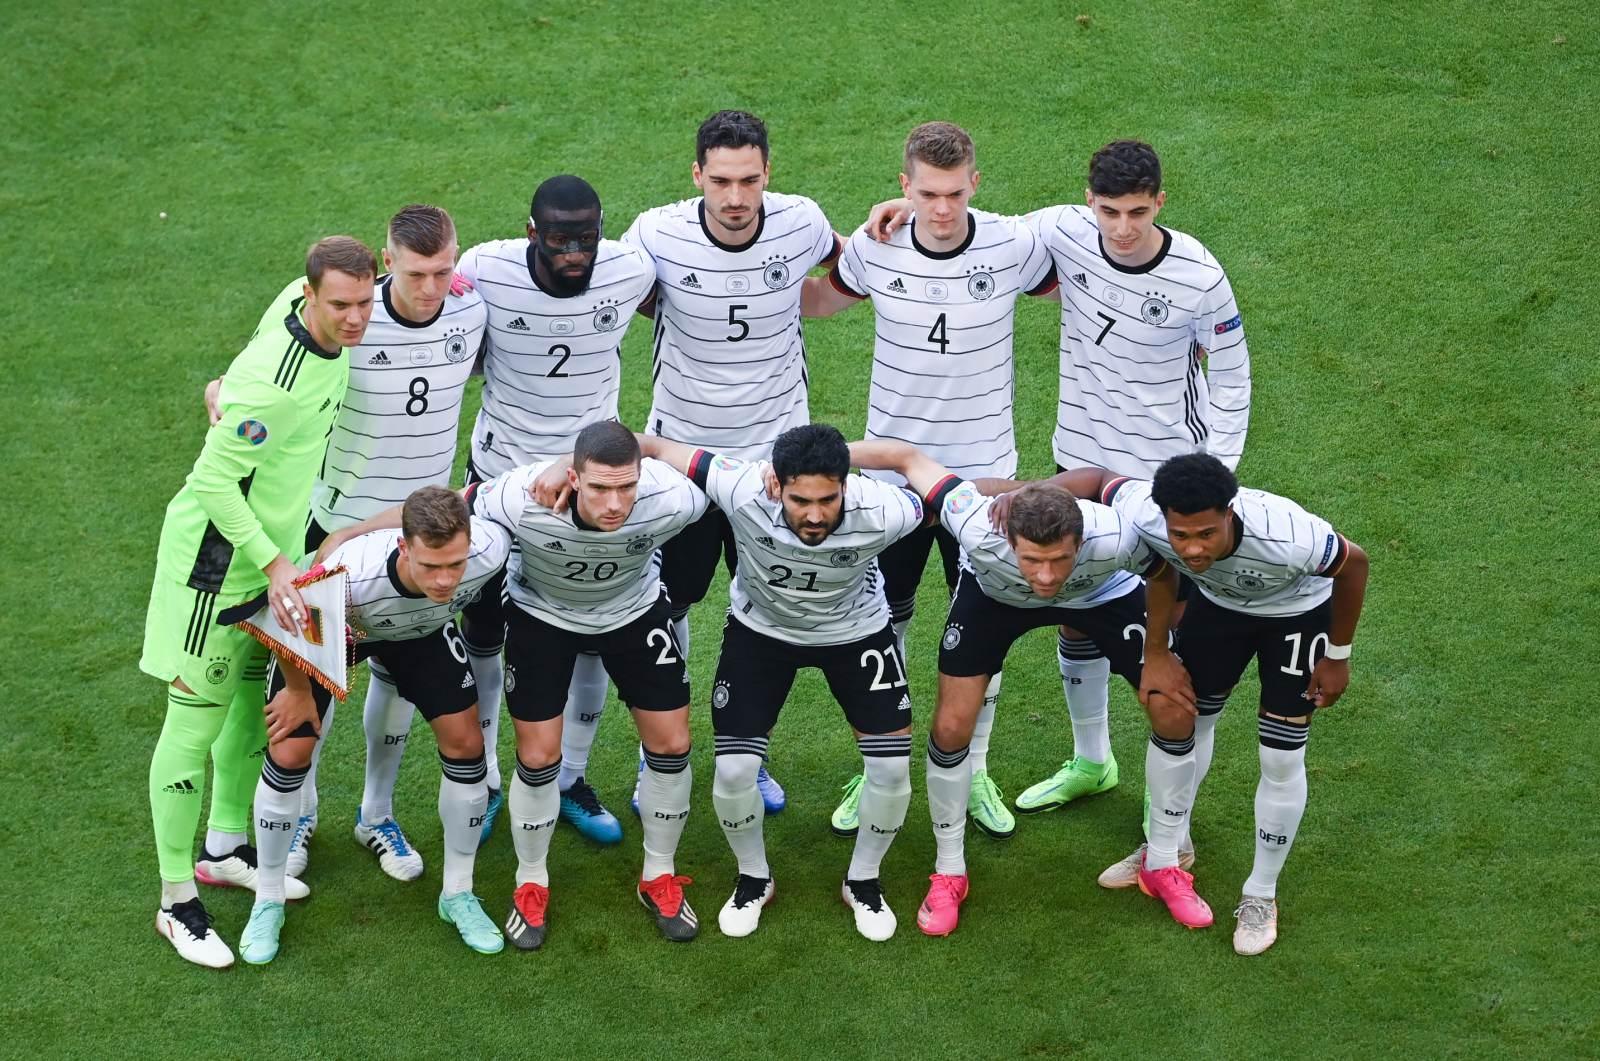 Исландия - Германия - 0:4 (закончен)